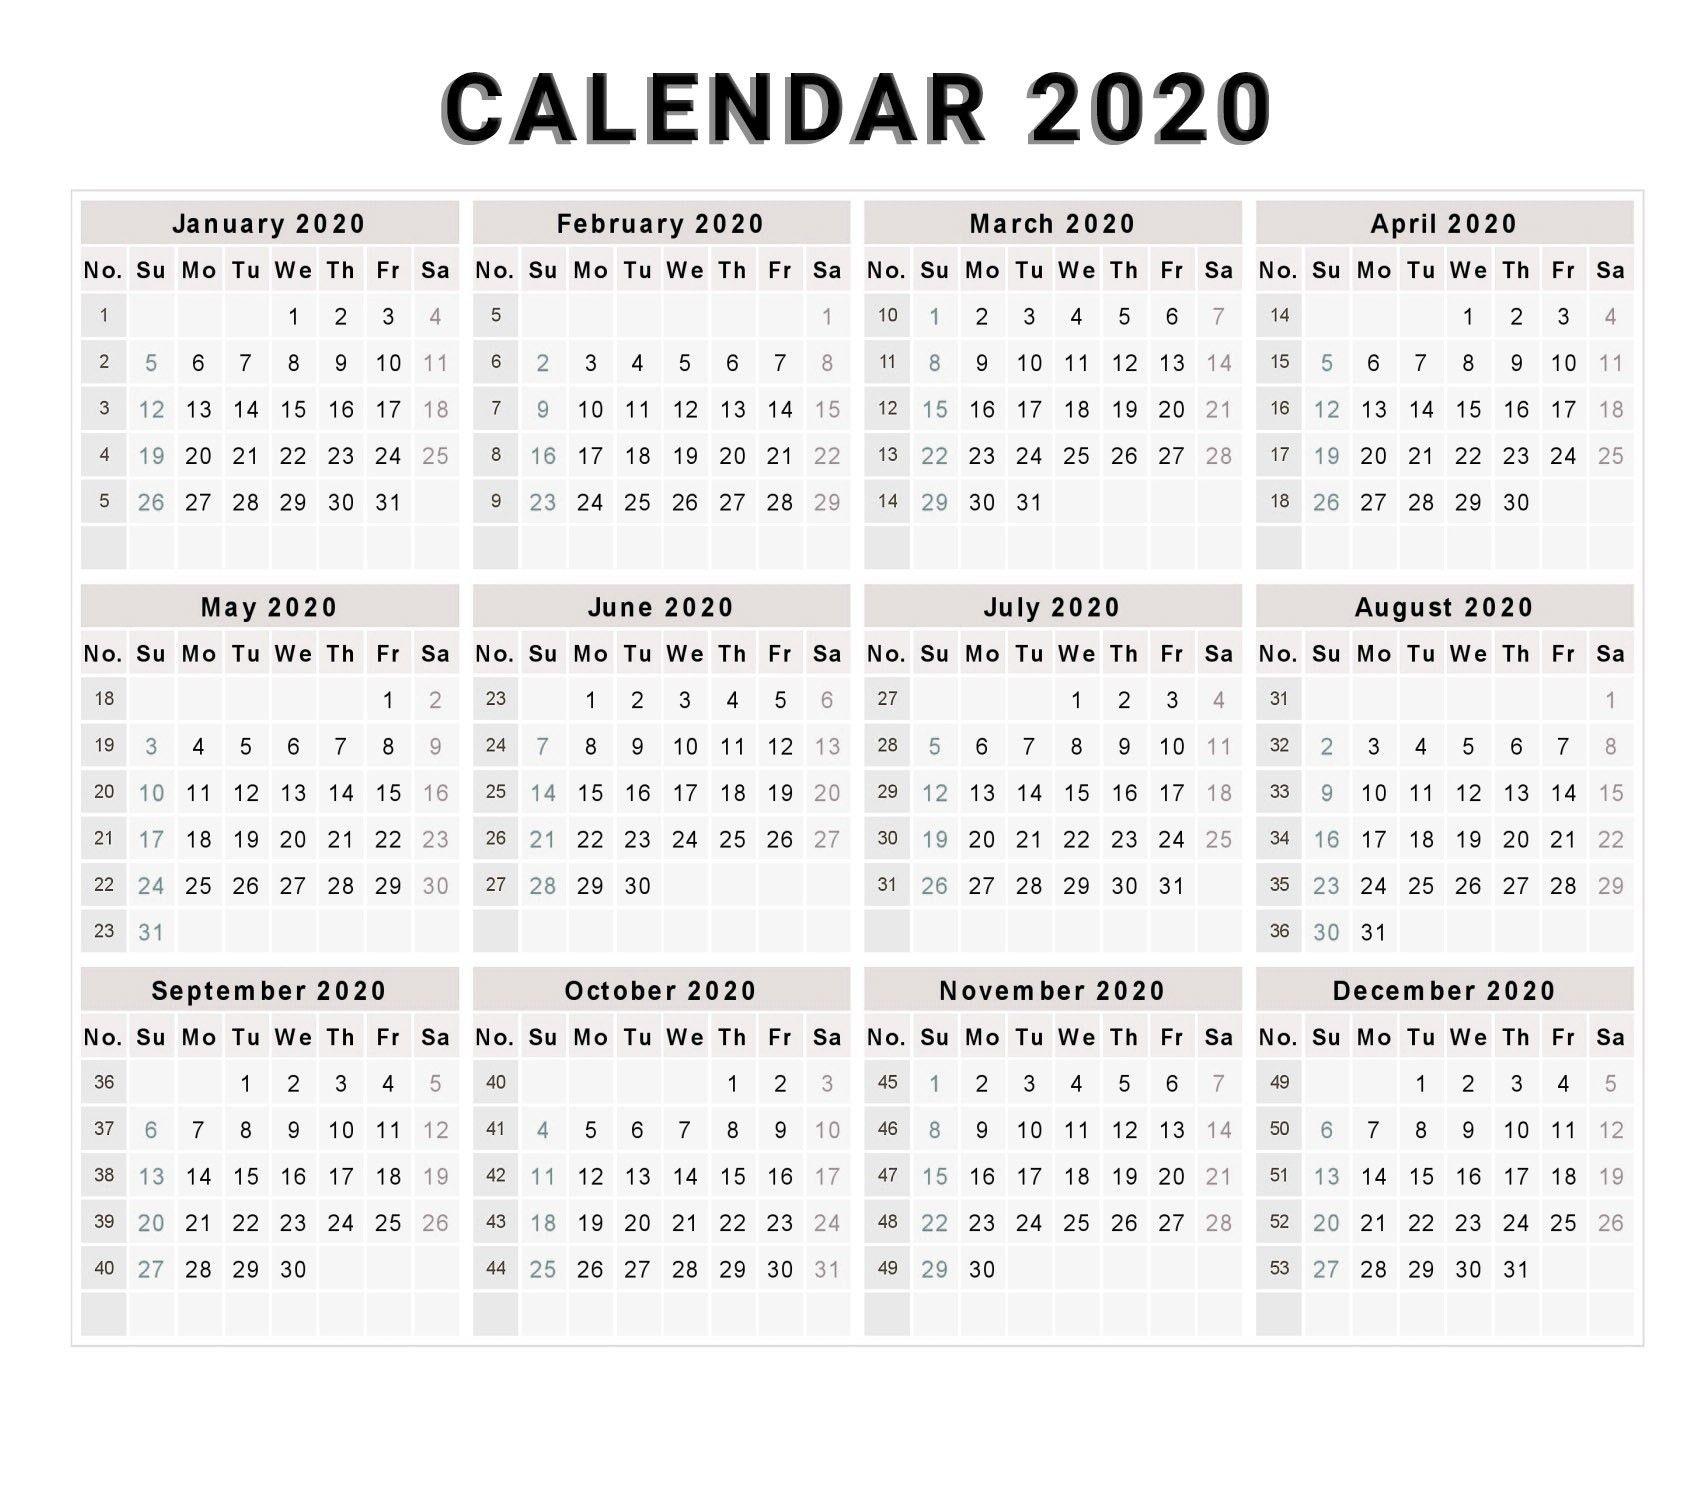 Calendar 2020 Free Printable Calendar 2020 Free 2020 for Yearly Printable Calendar 2020